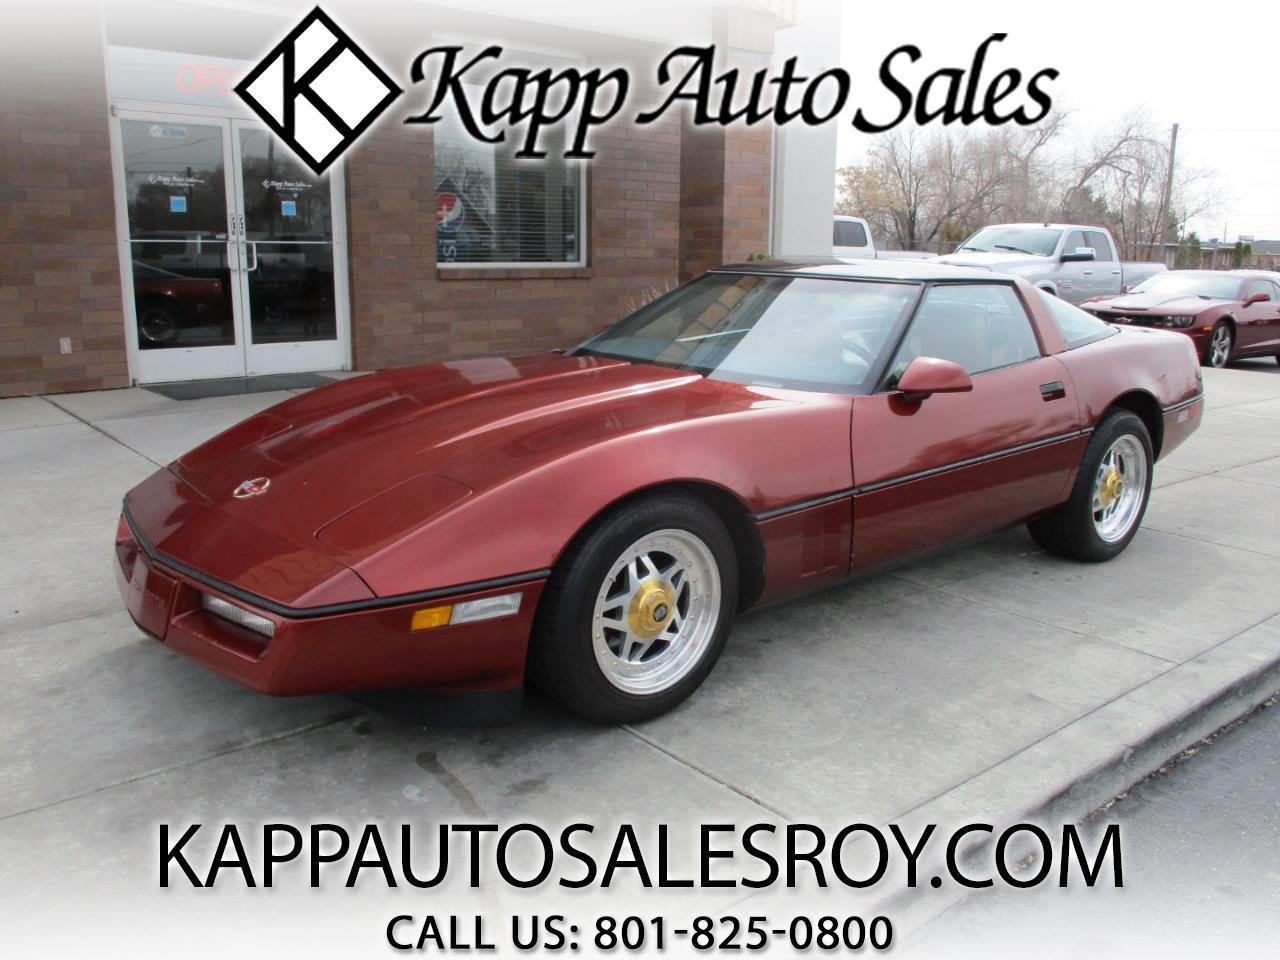 1986 Chevrolet Corvette 2dr Hatchback Coupe